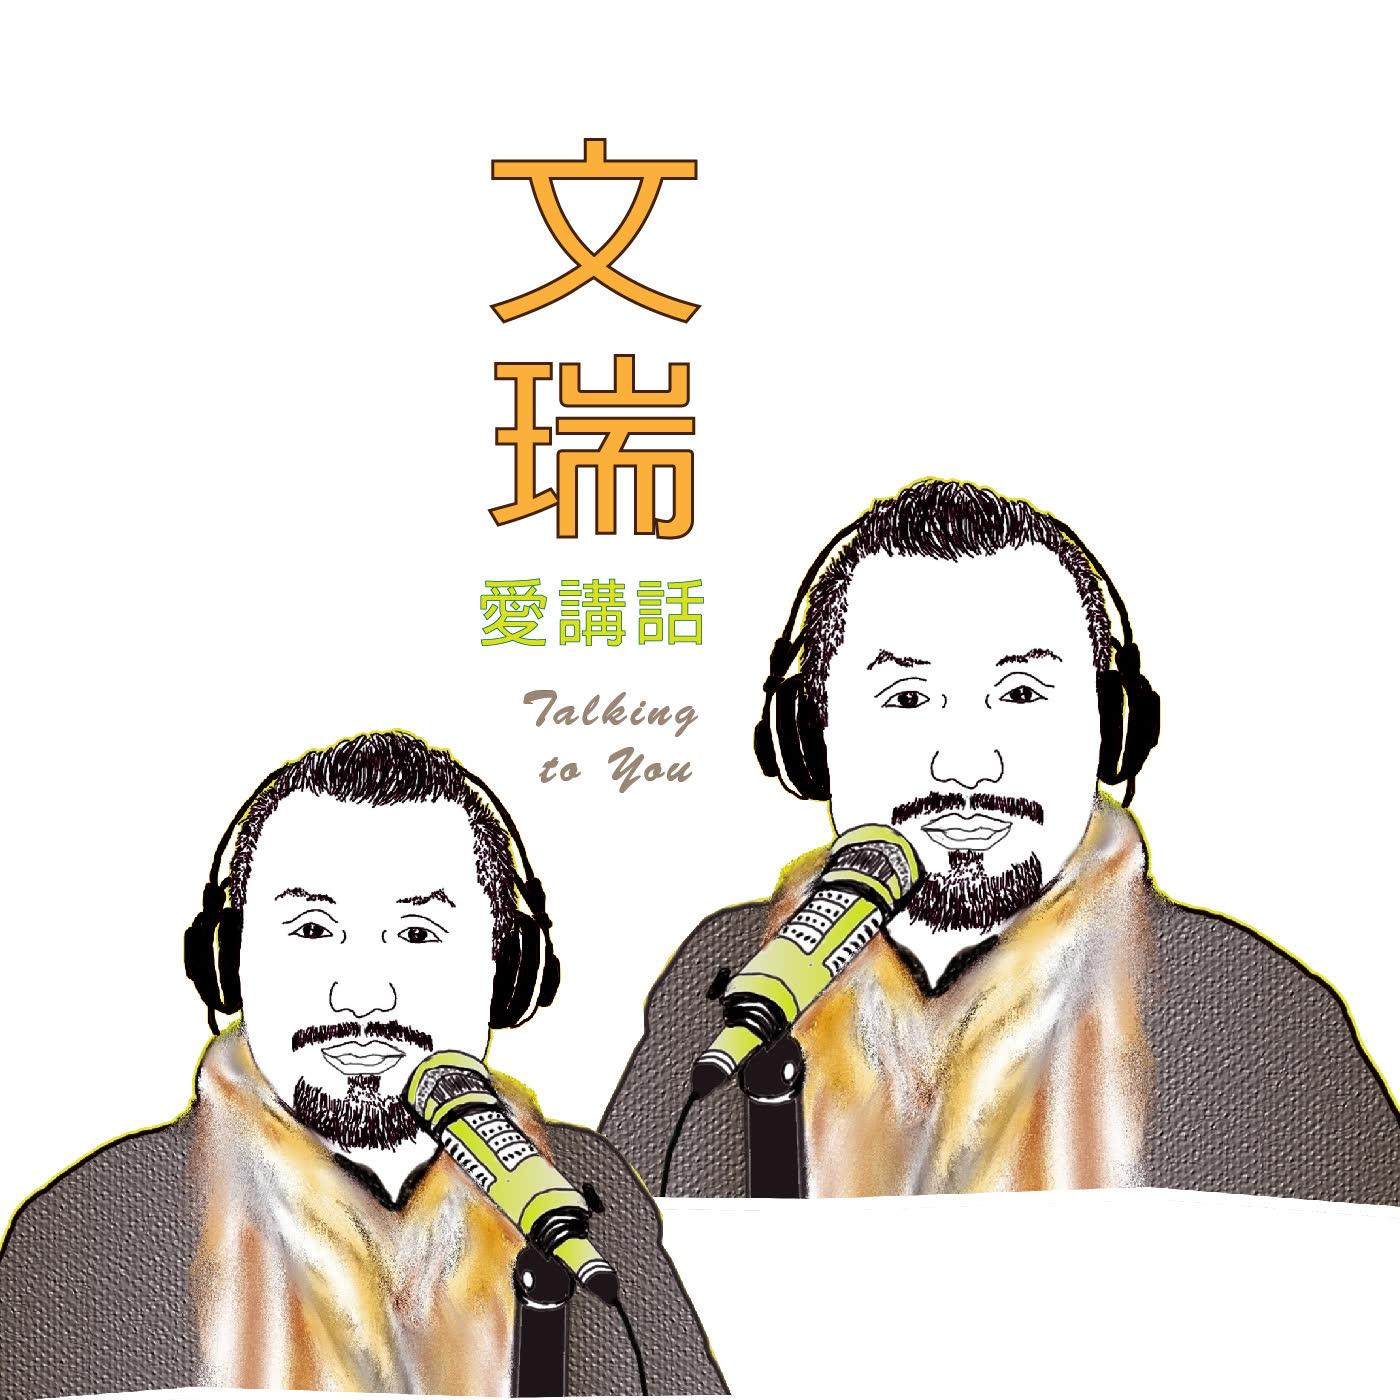 WJT011【創生地方事】玉里193玩耍實驗 talking with 移居實驗事大熊